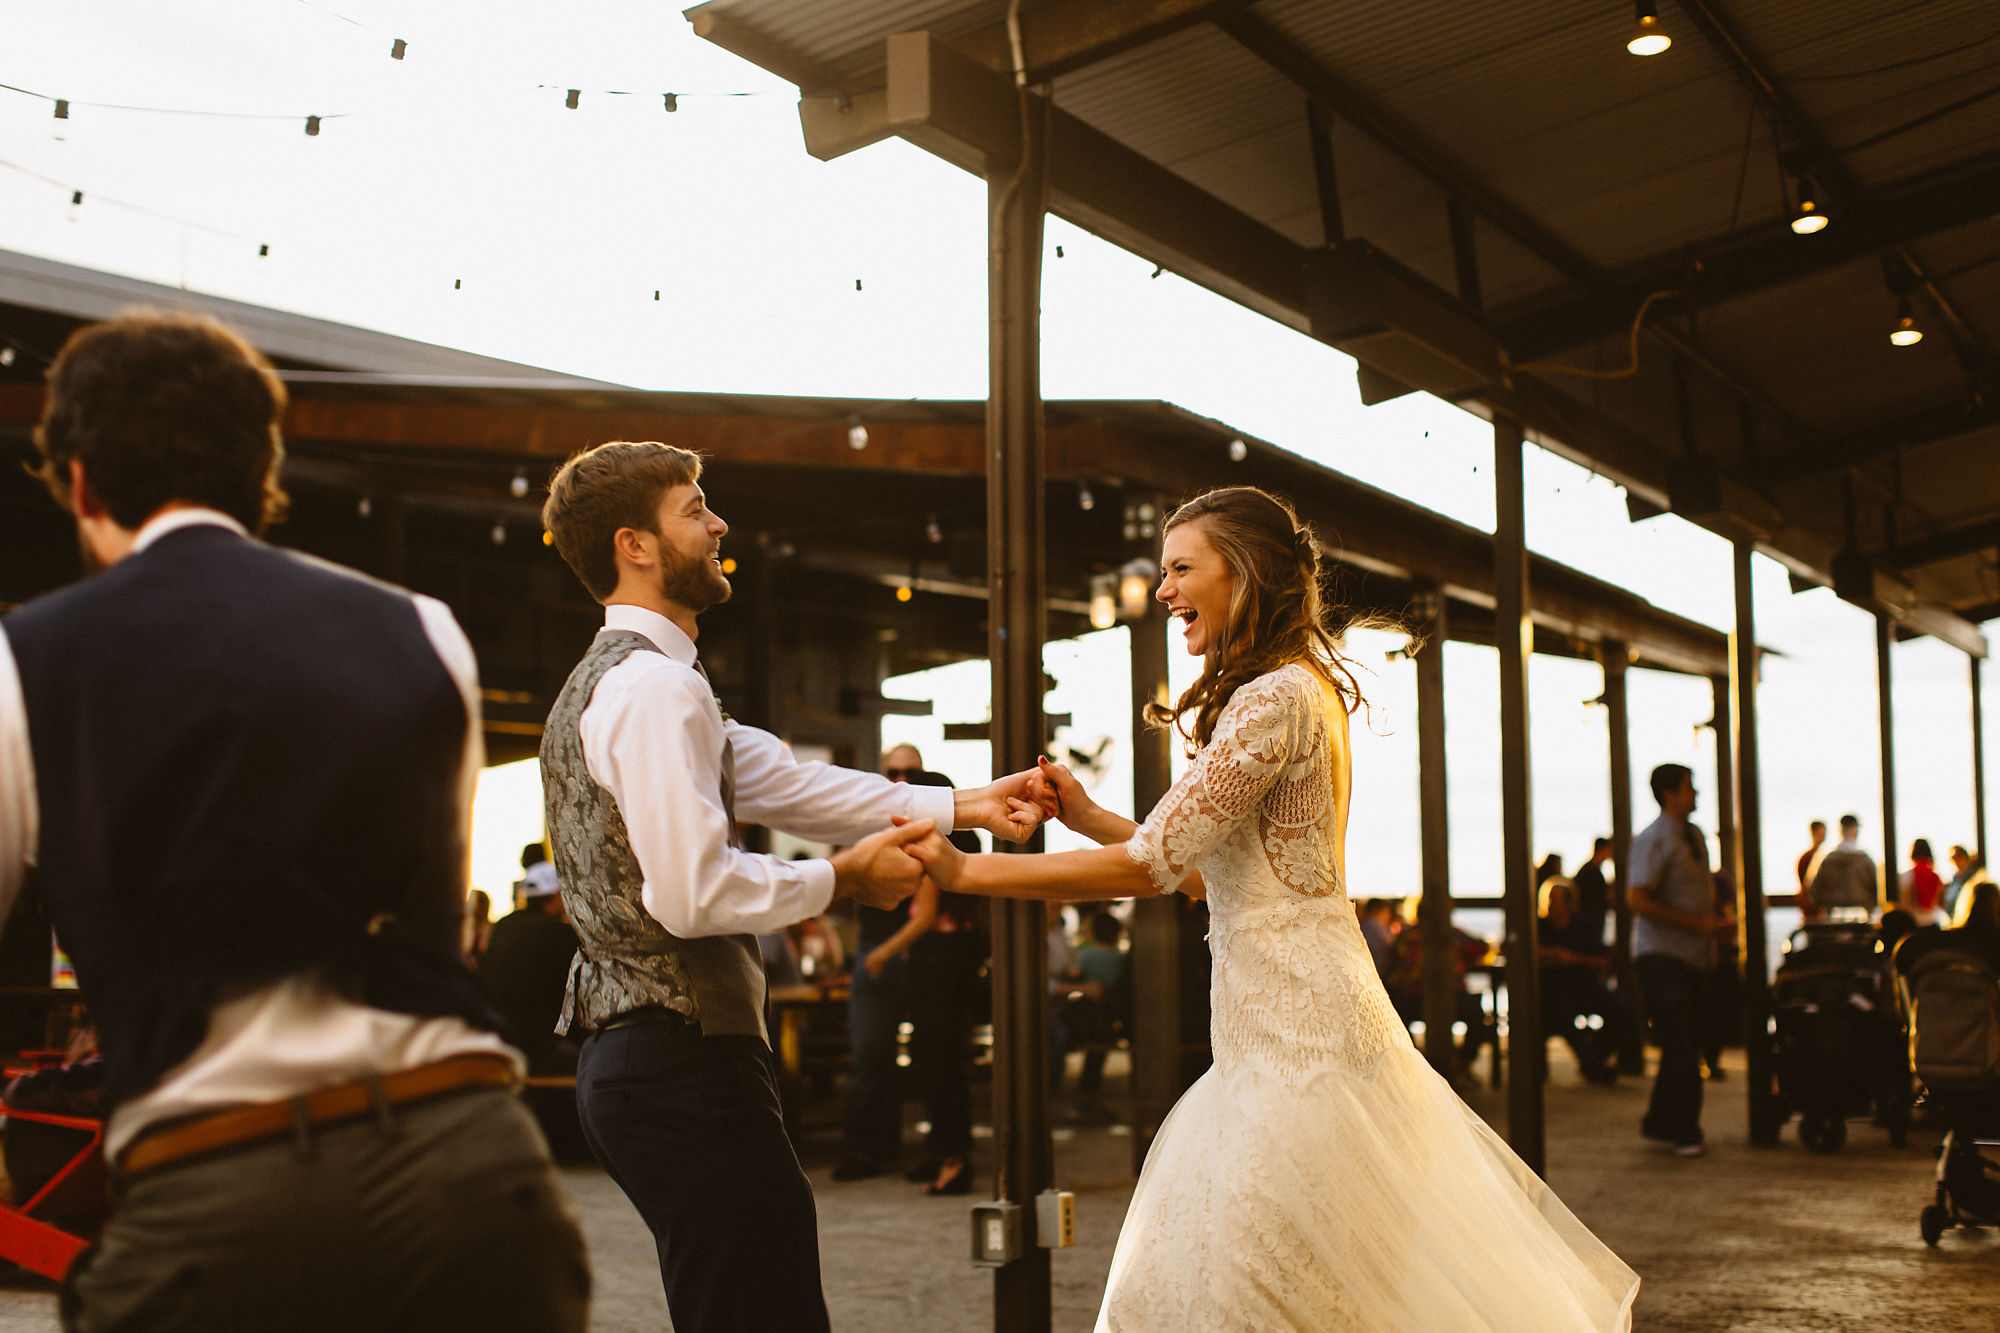 jessica_austin_oasis_brewery_wedding_photos181823.jpg